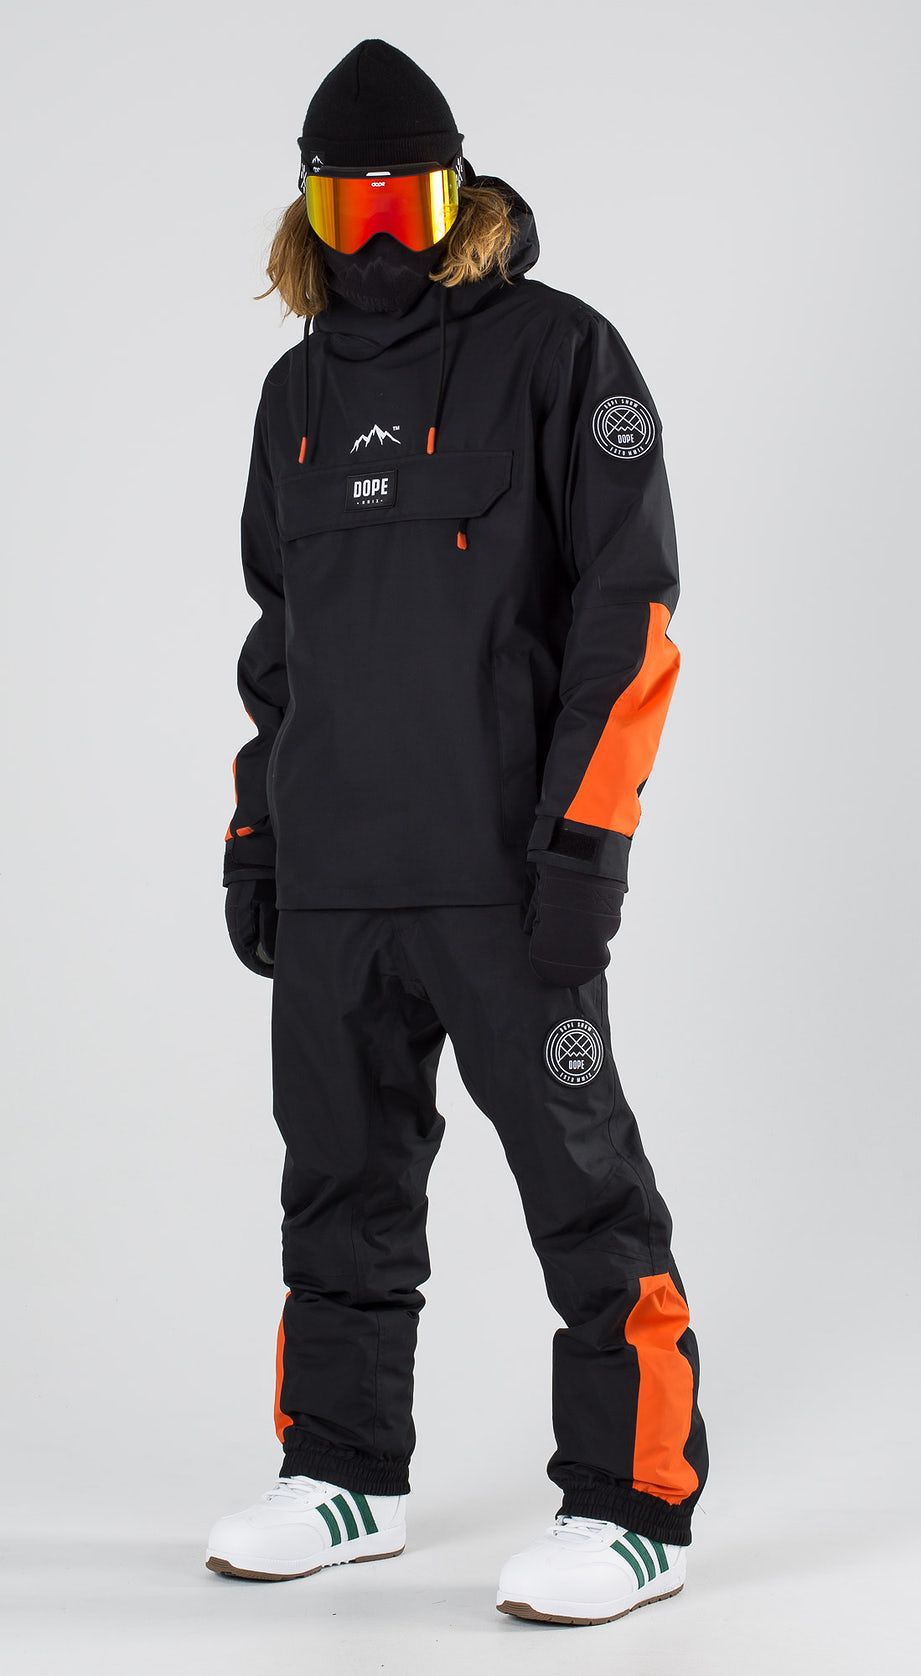 Dope Blizzard LE Black Orange Snowboard clothing Multi